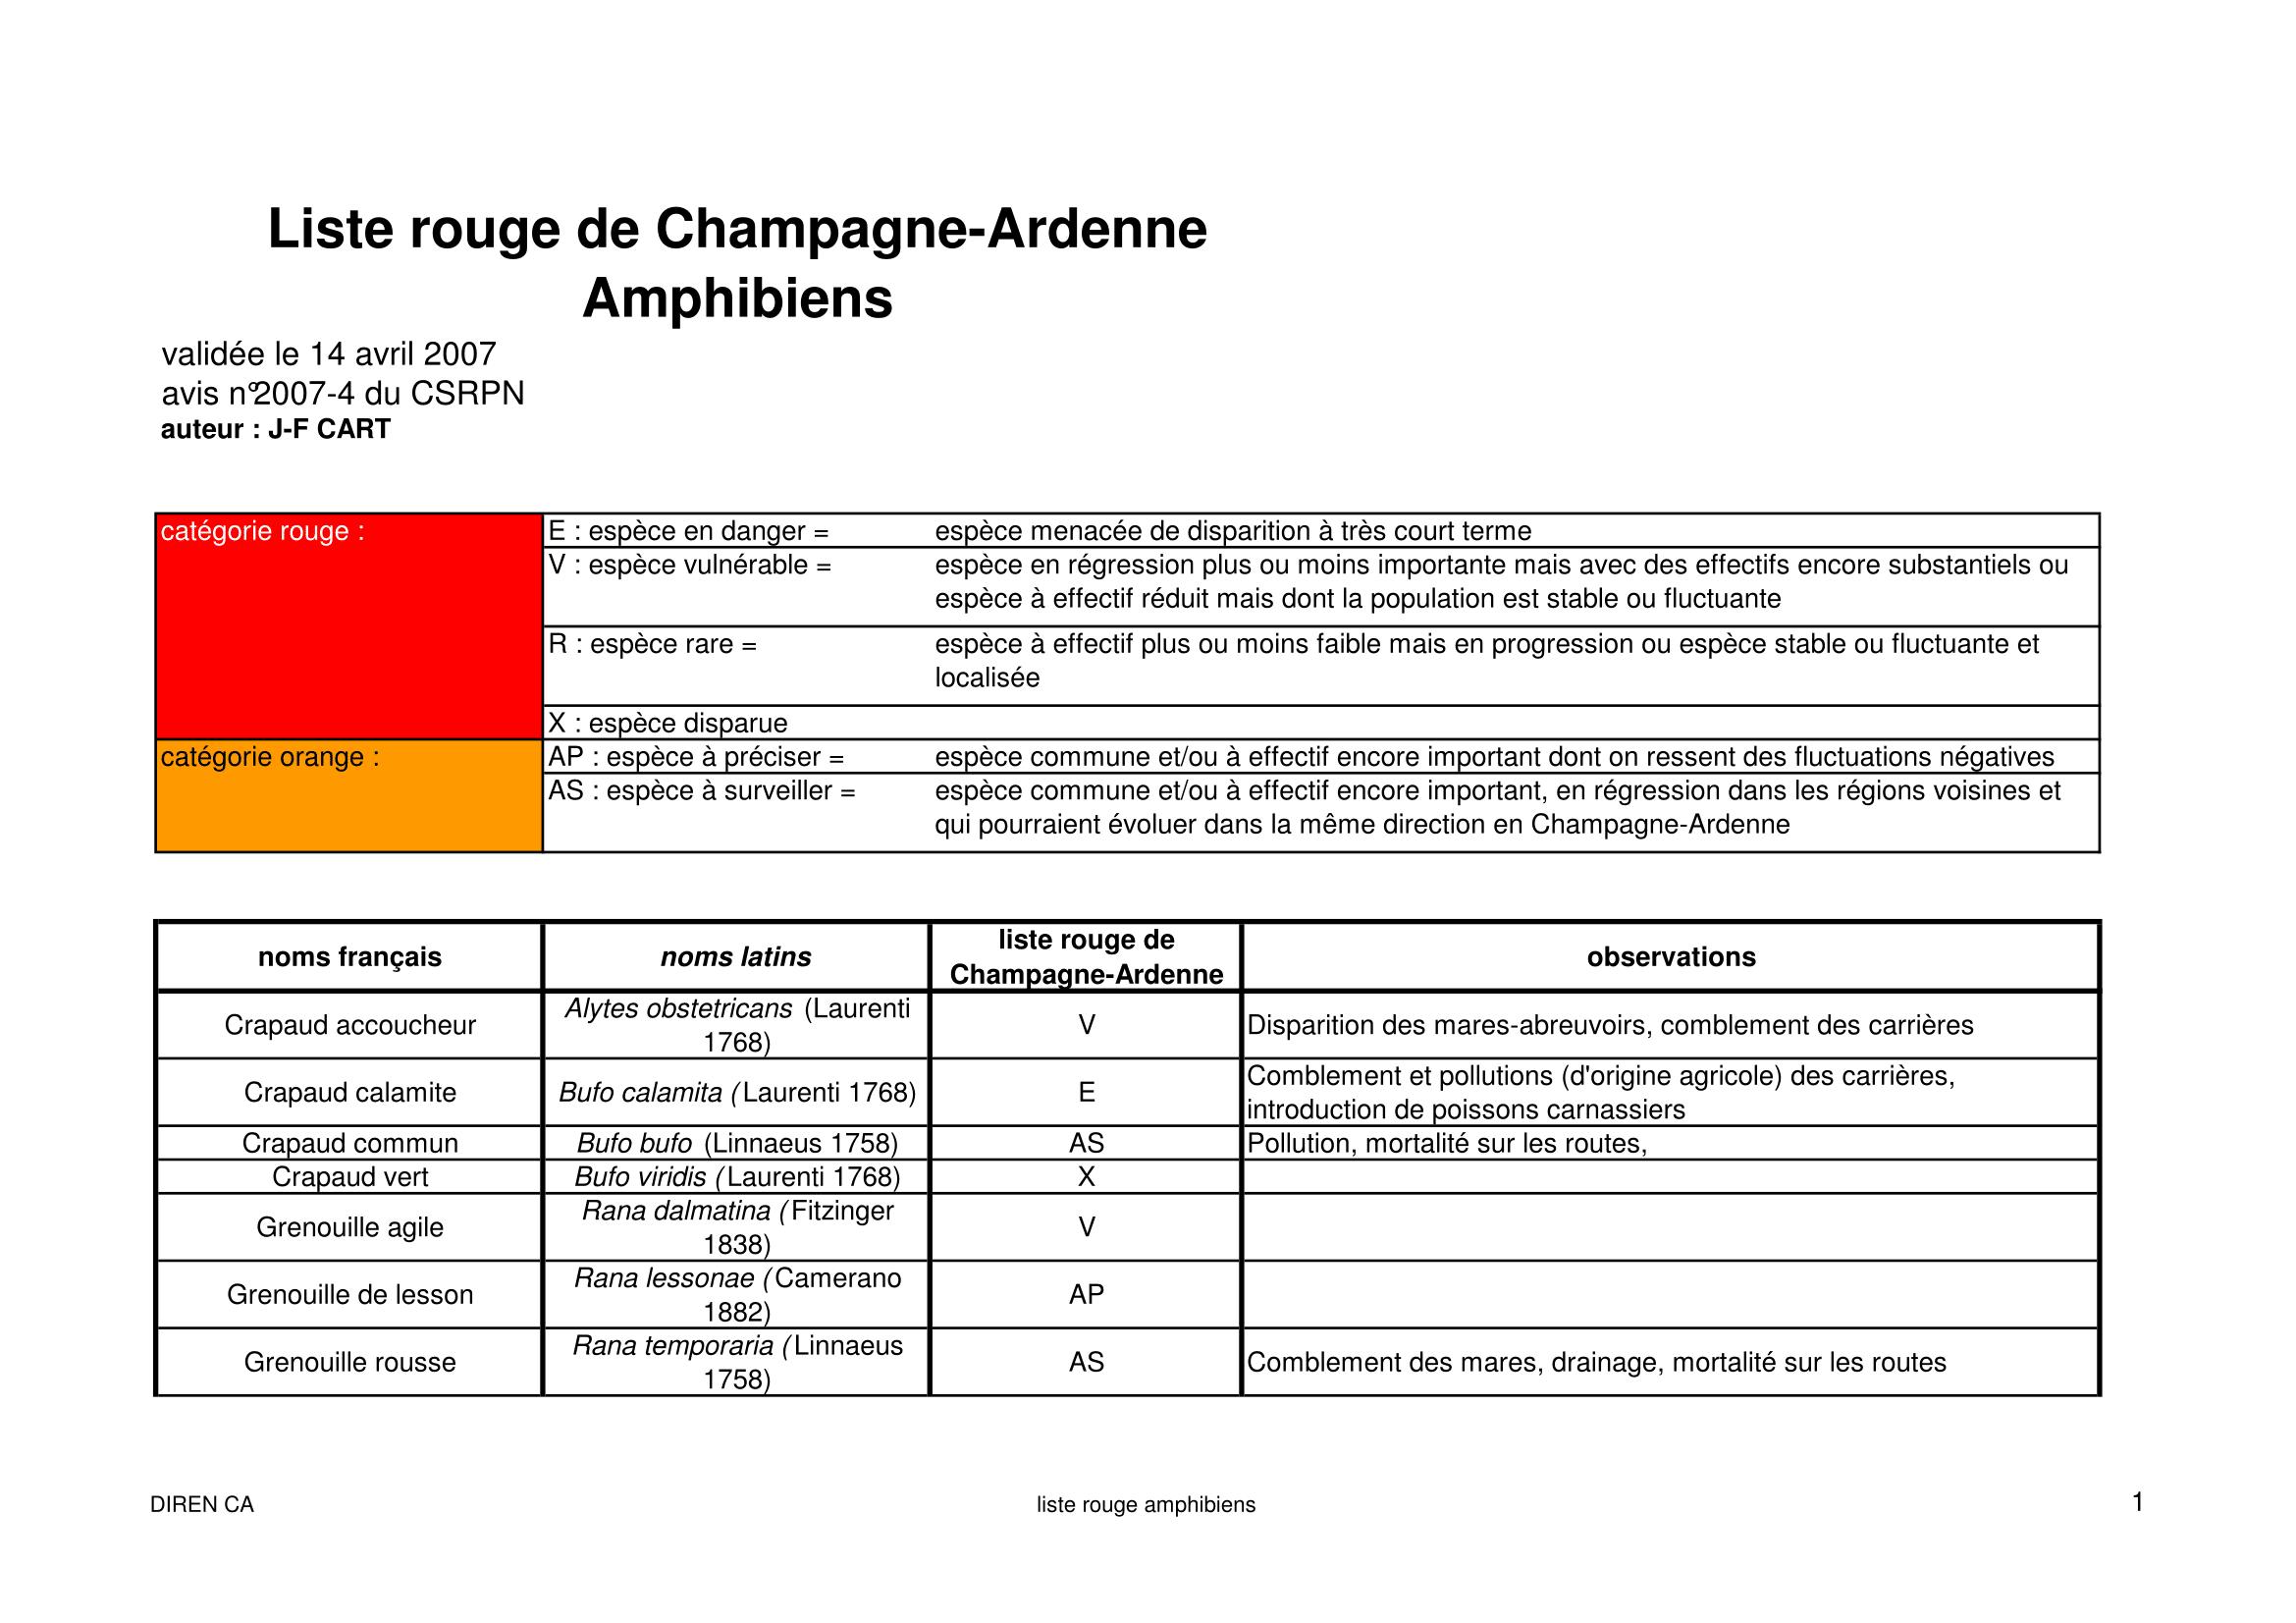 Amphibiens (CA)